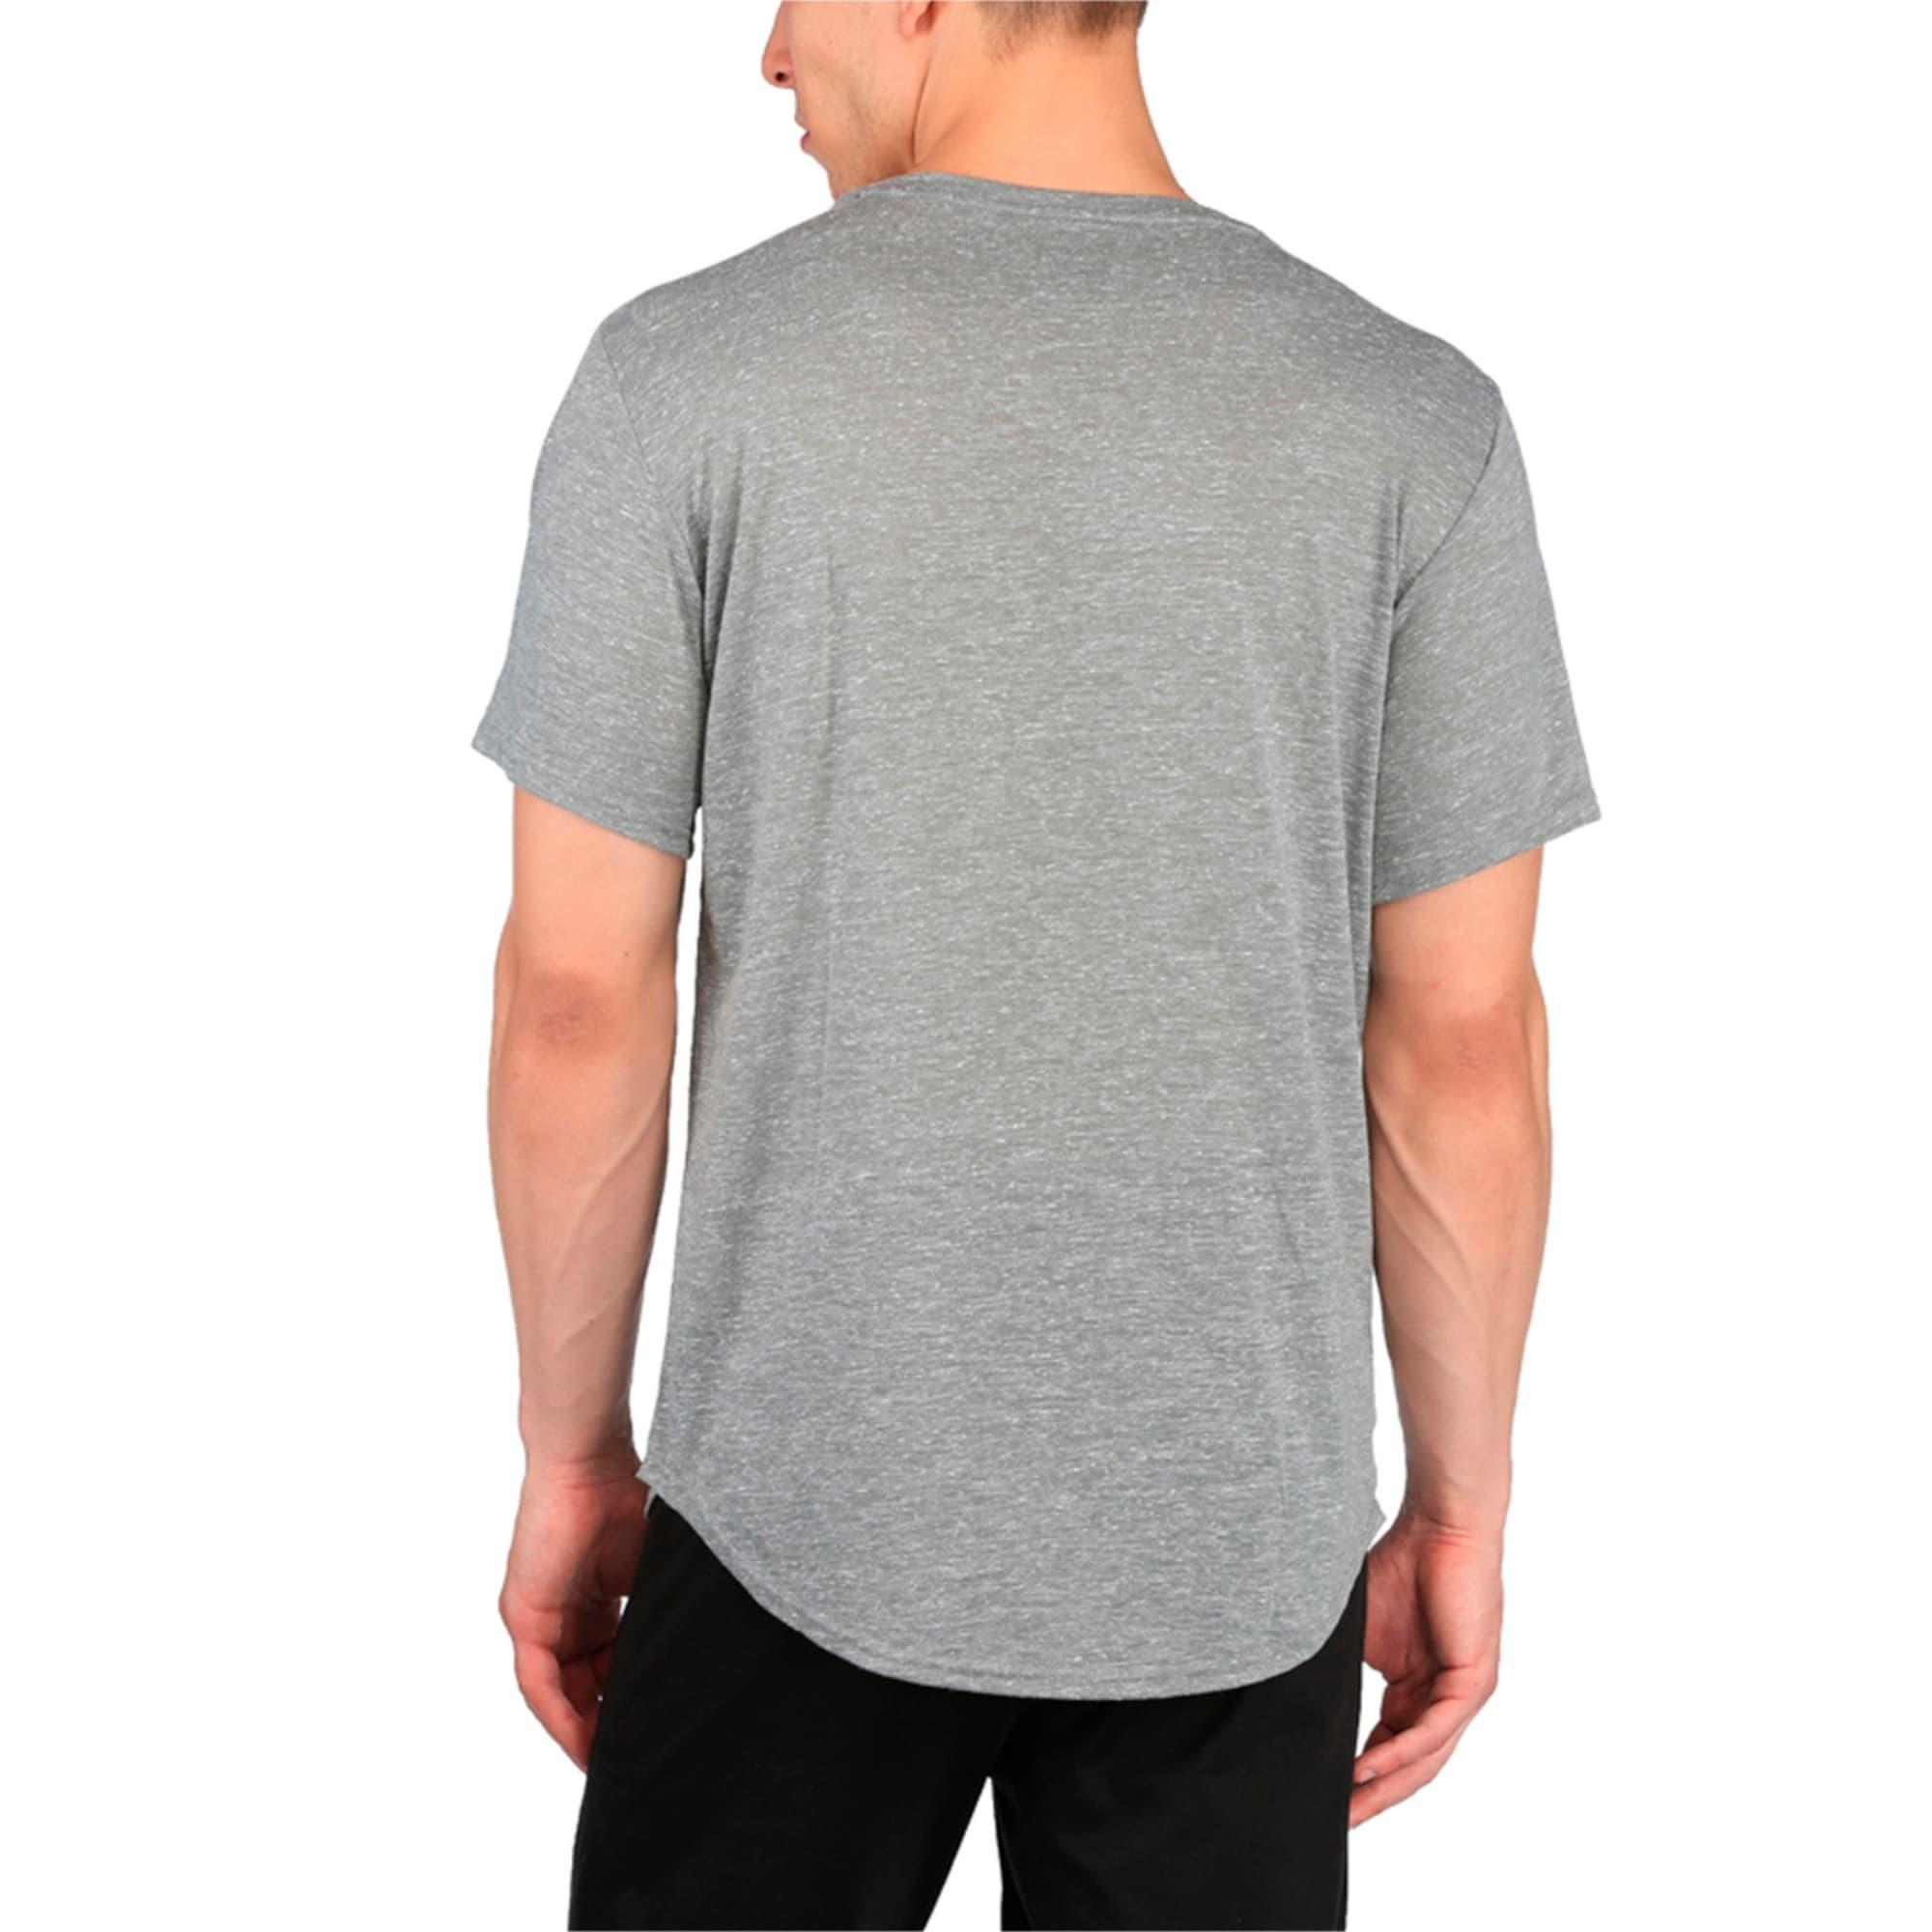 Thumbnail 2 of Active Training Men's Dri-Release® Novelty T-Shirt, Medium Gray Heather, medium-IND